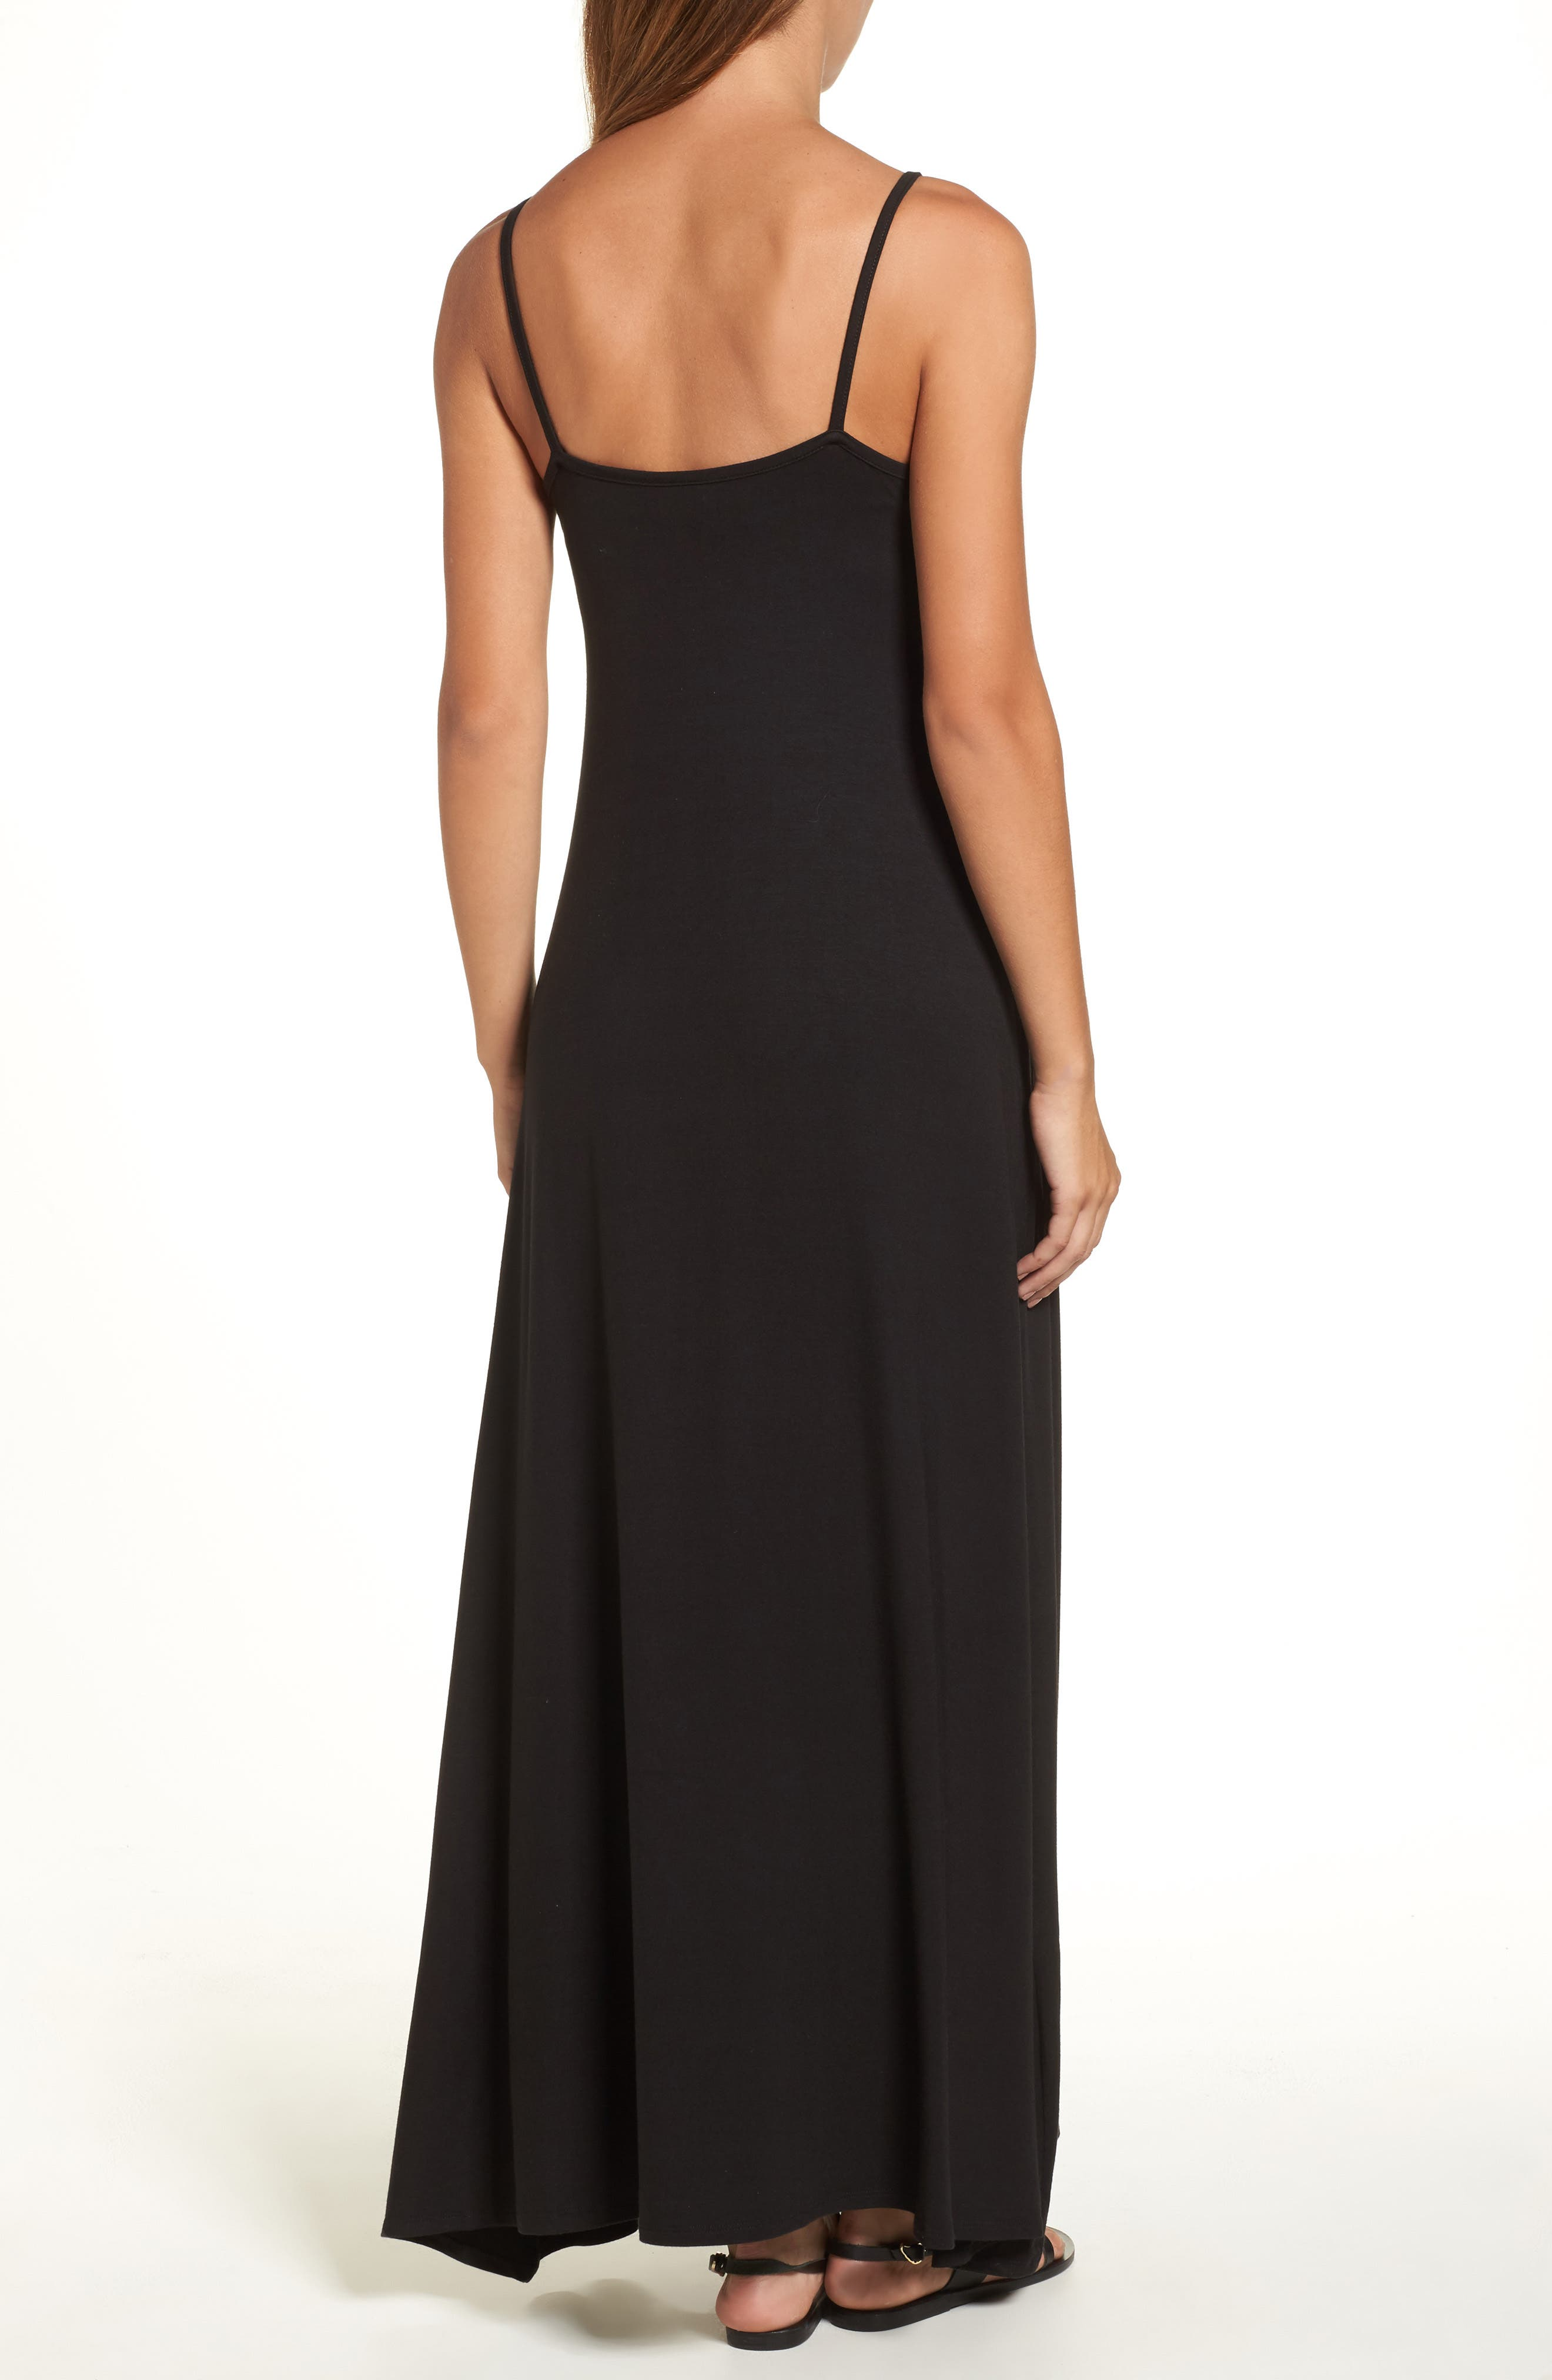 LOVEAPPELLA, Knit Maxi Dress, Alternate thumbnail 2, color, BLACK